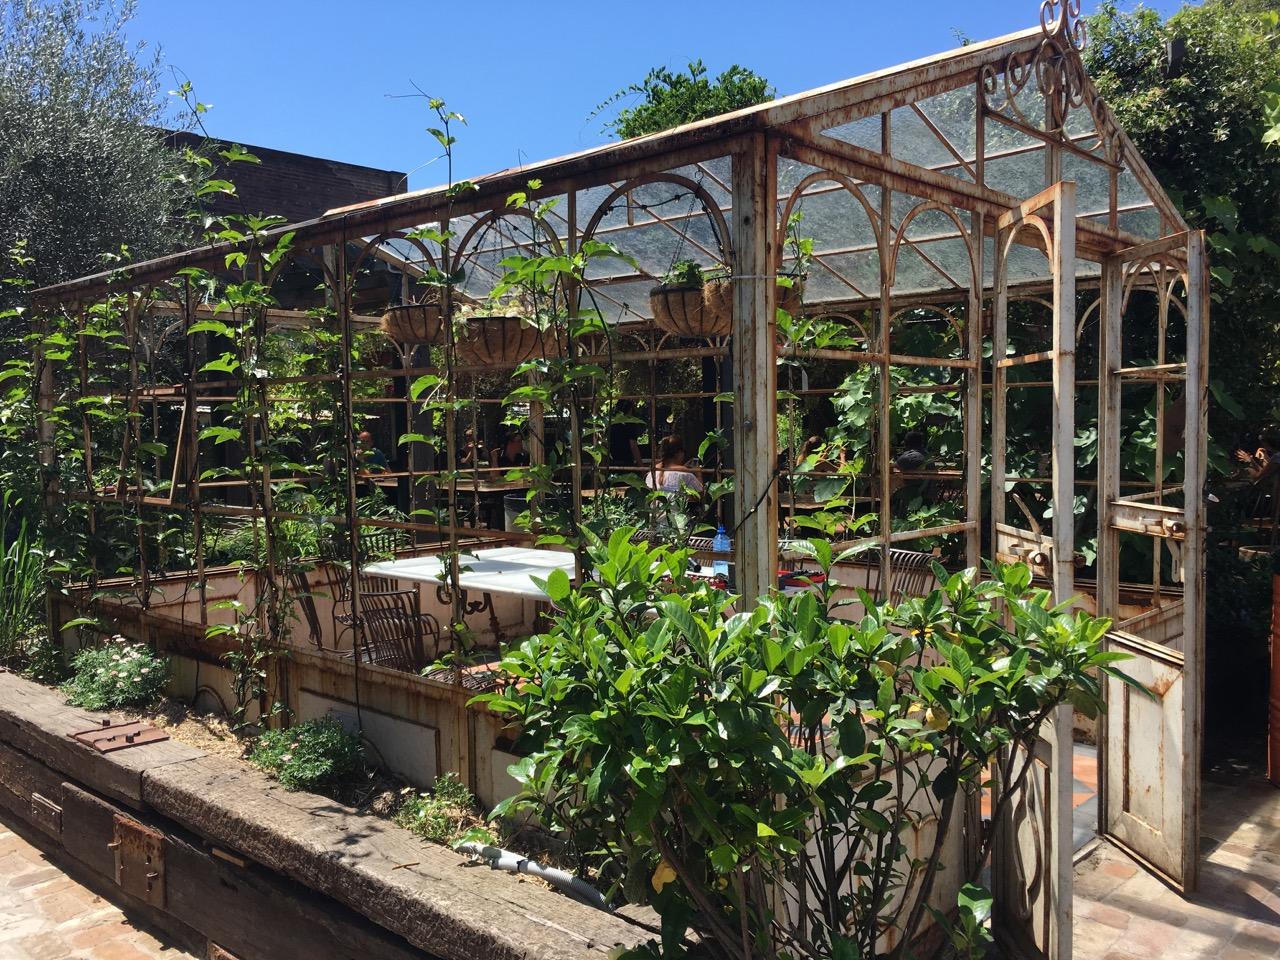 The Potting Shed Alexandria Janna Schreier Garden Design